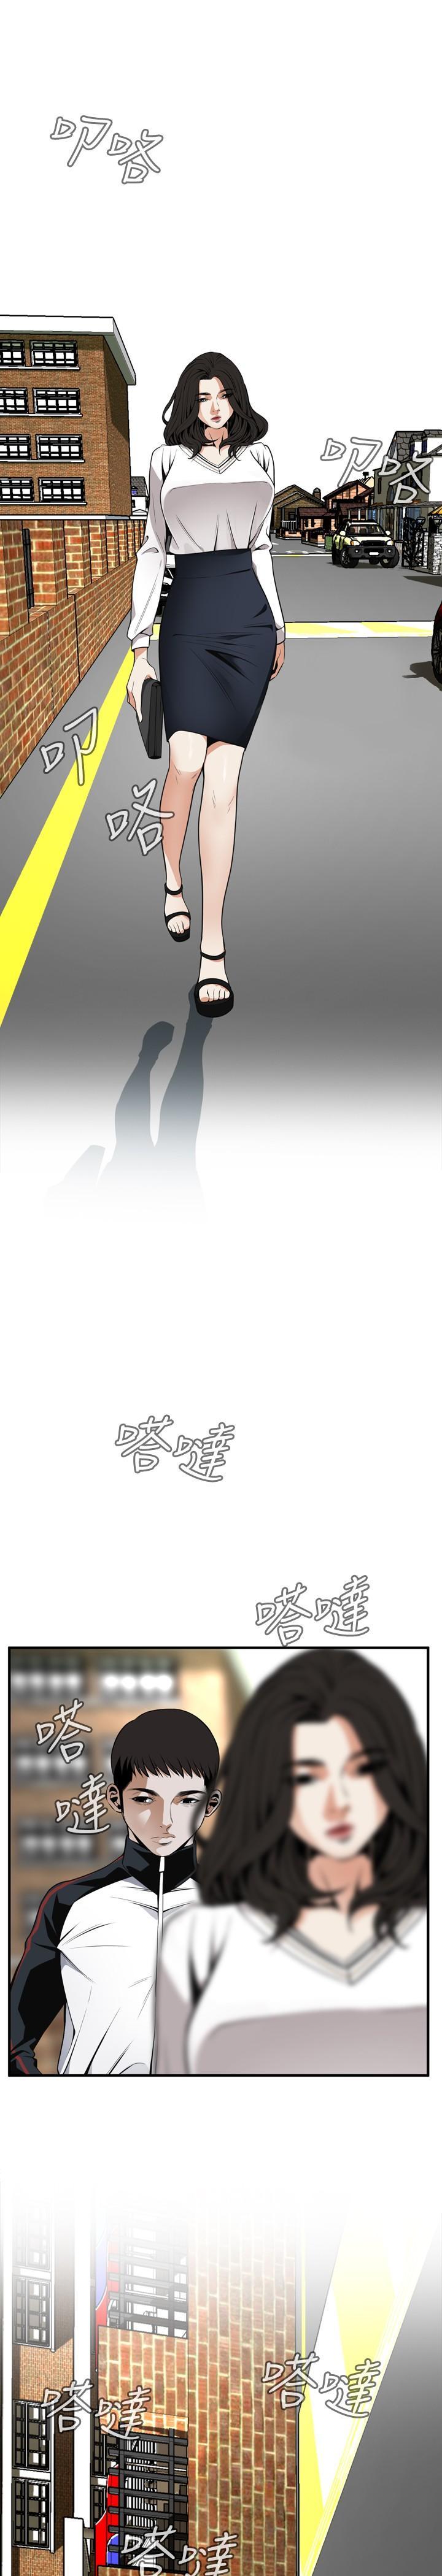 Take a Peek 偷窥 Ch.39~51 [Chinese]中文 92